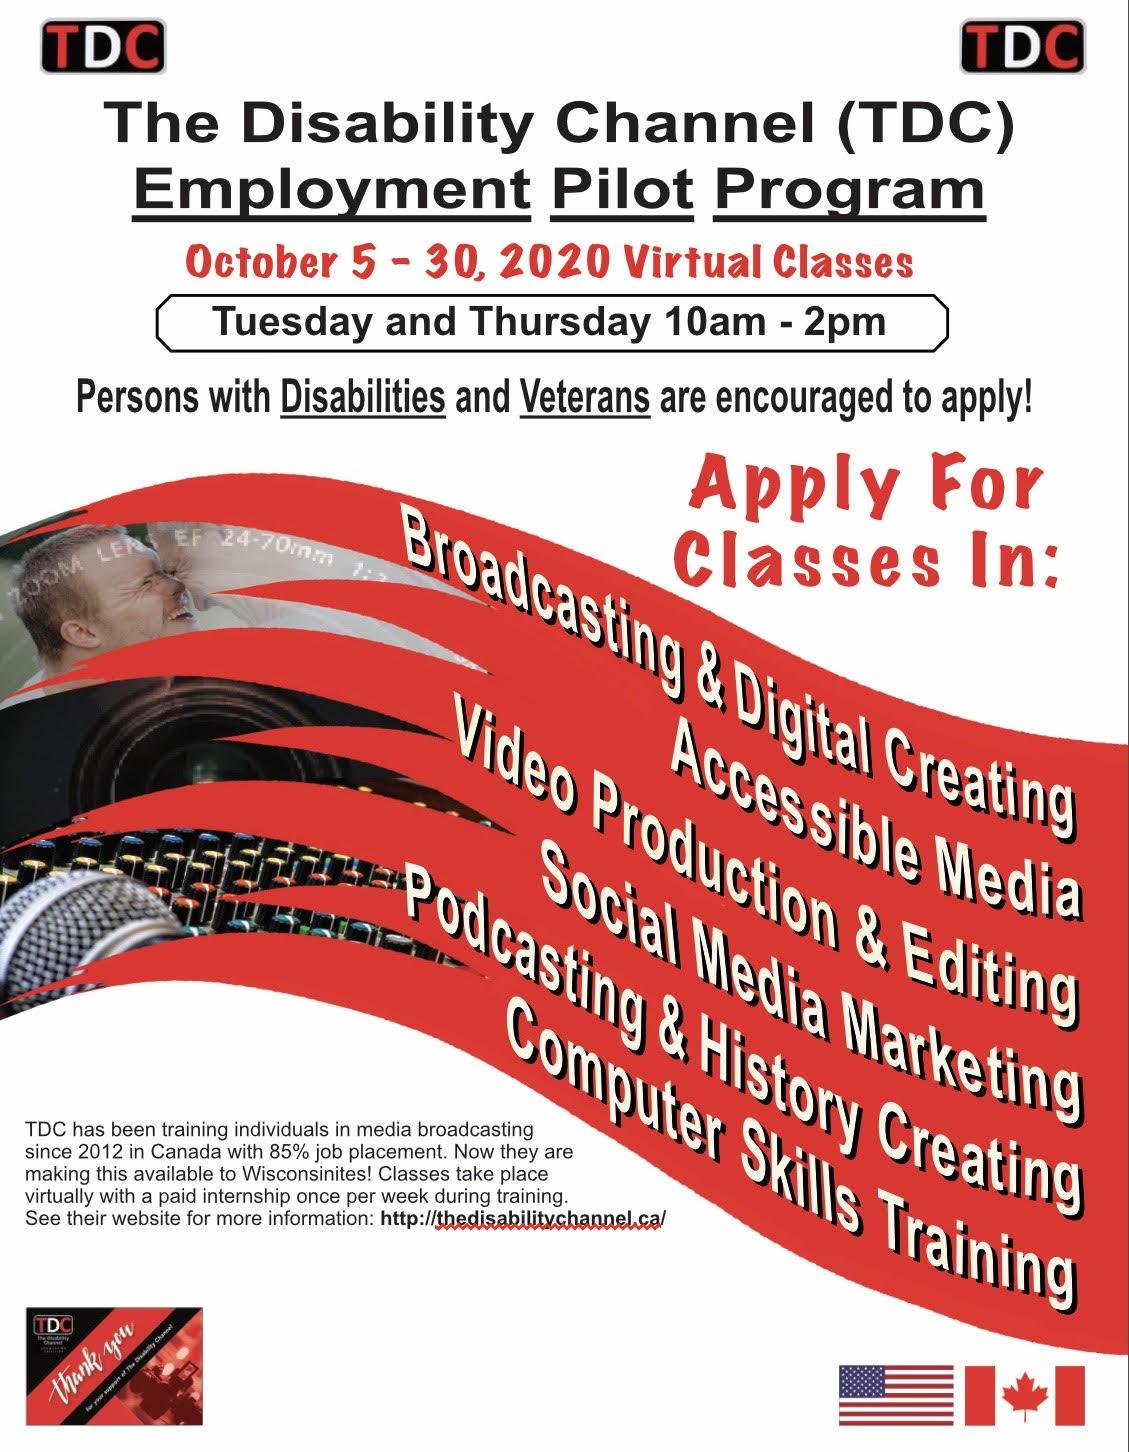 TDC Employment Pilot Program - October 5 - 30, 2020 Virtual Classes